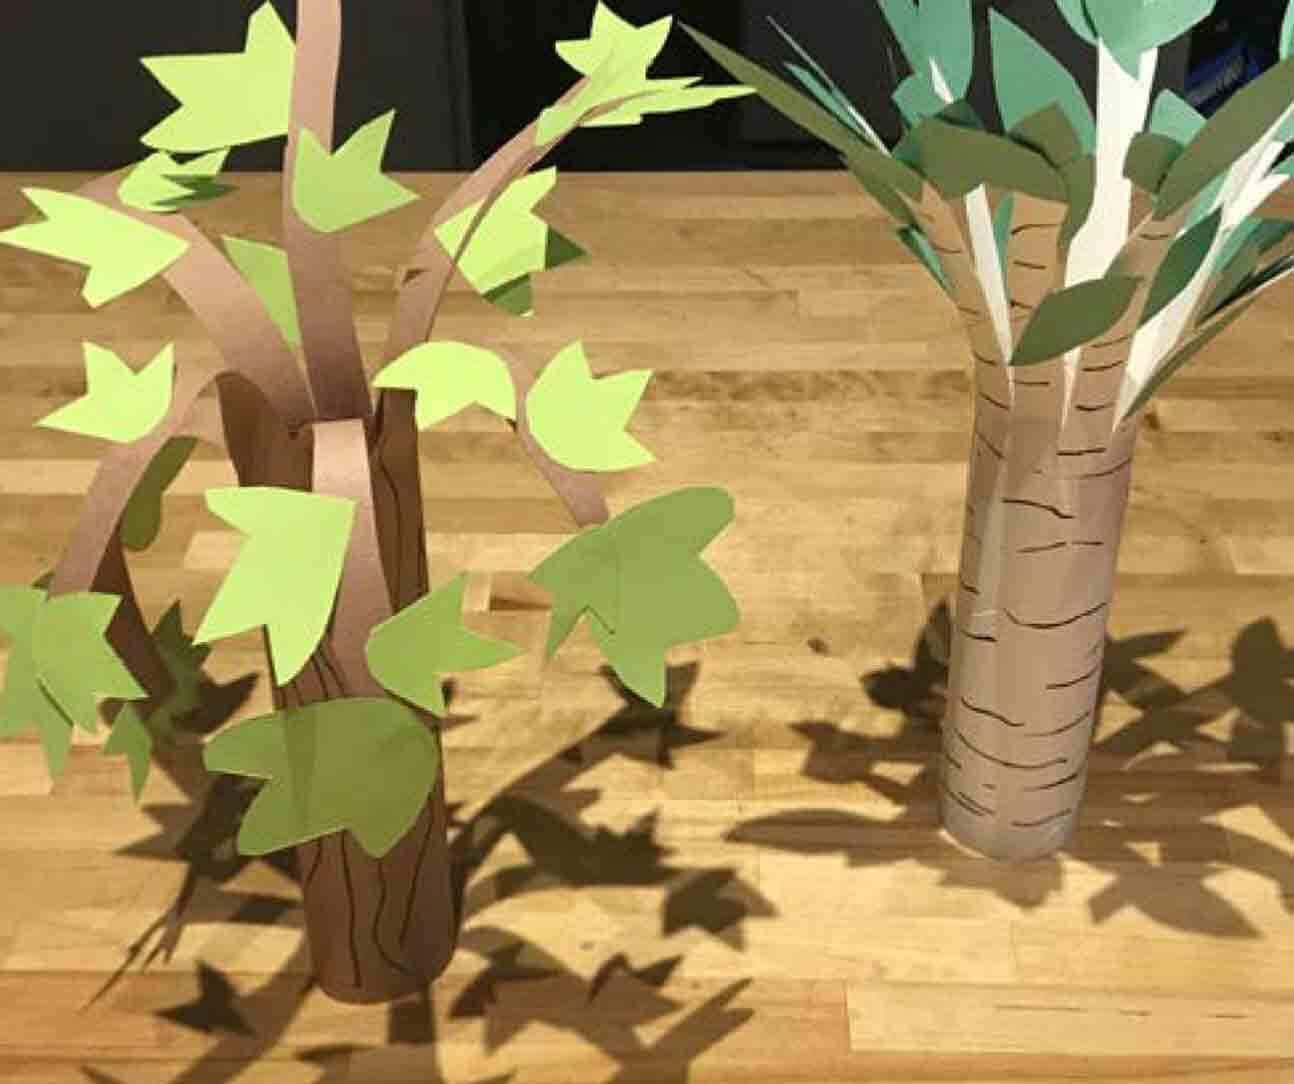 Arbor Day Drop-in Art Making